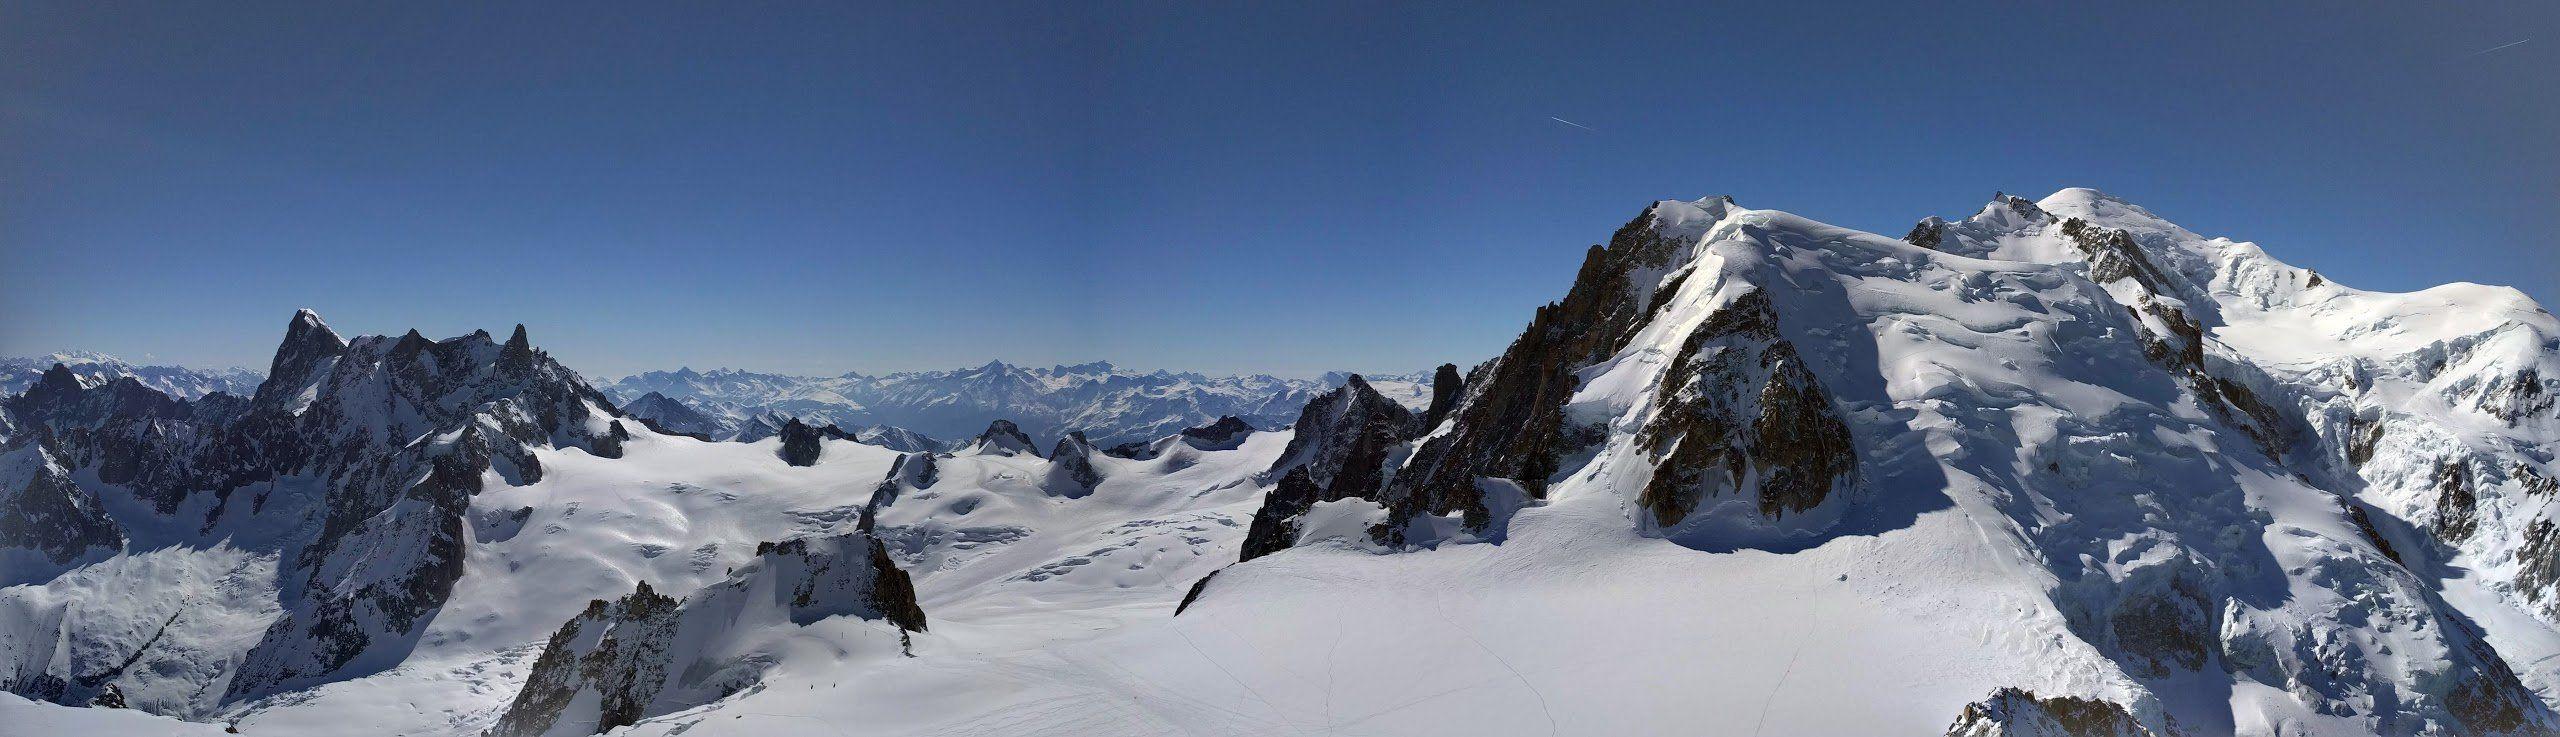 Panorama aiguille du midi mont-blanc, chamonix, france, alpes